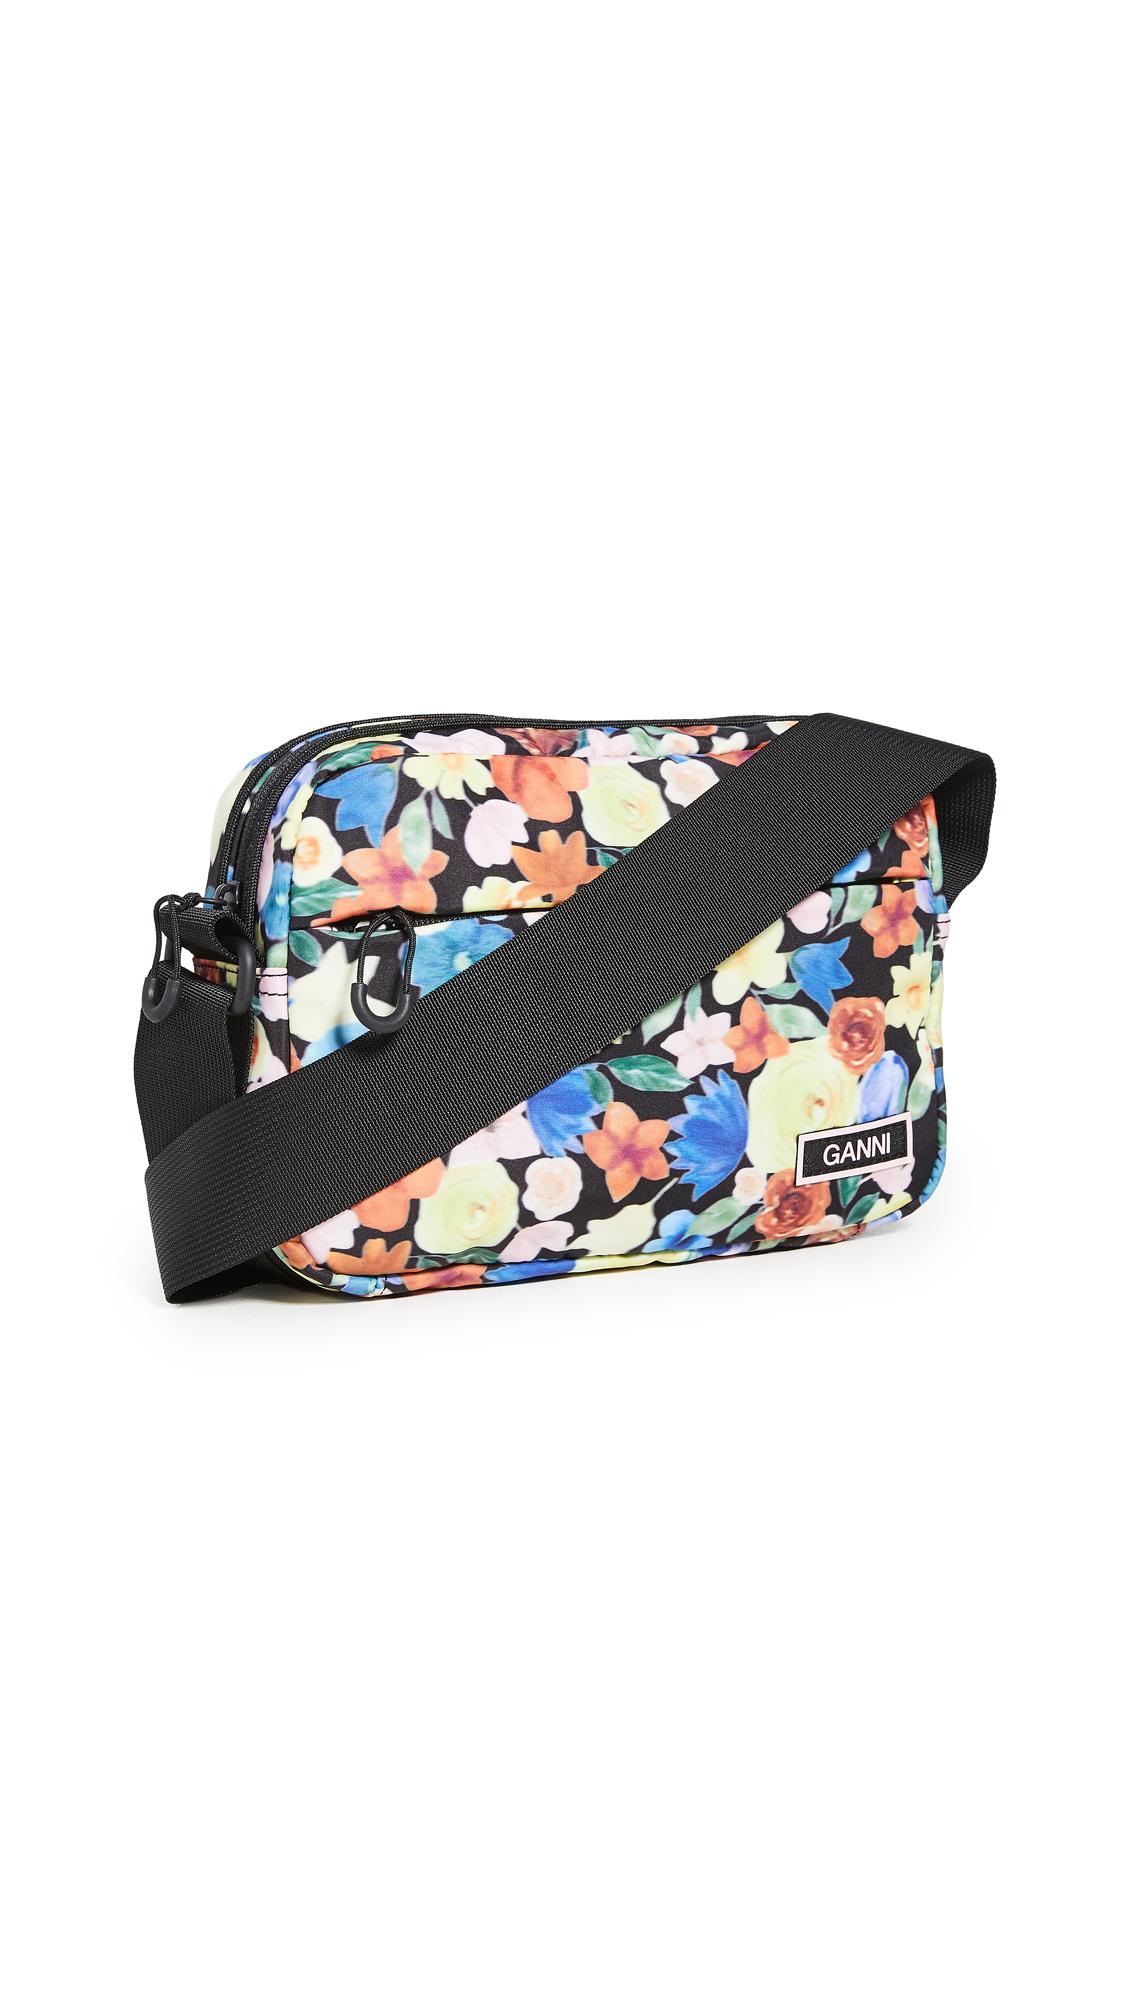 GANNI Recycled Tech Fabric Crossbody Bag